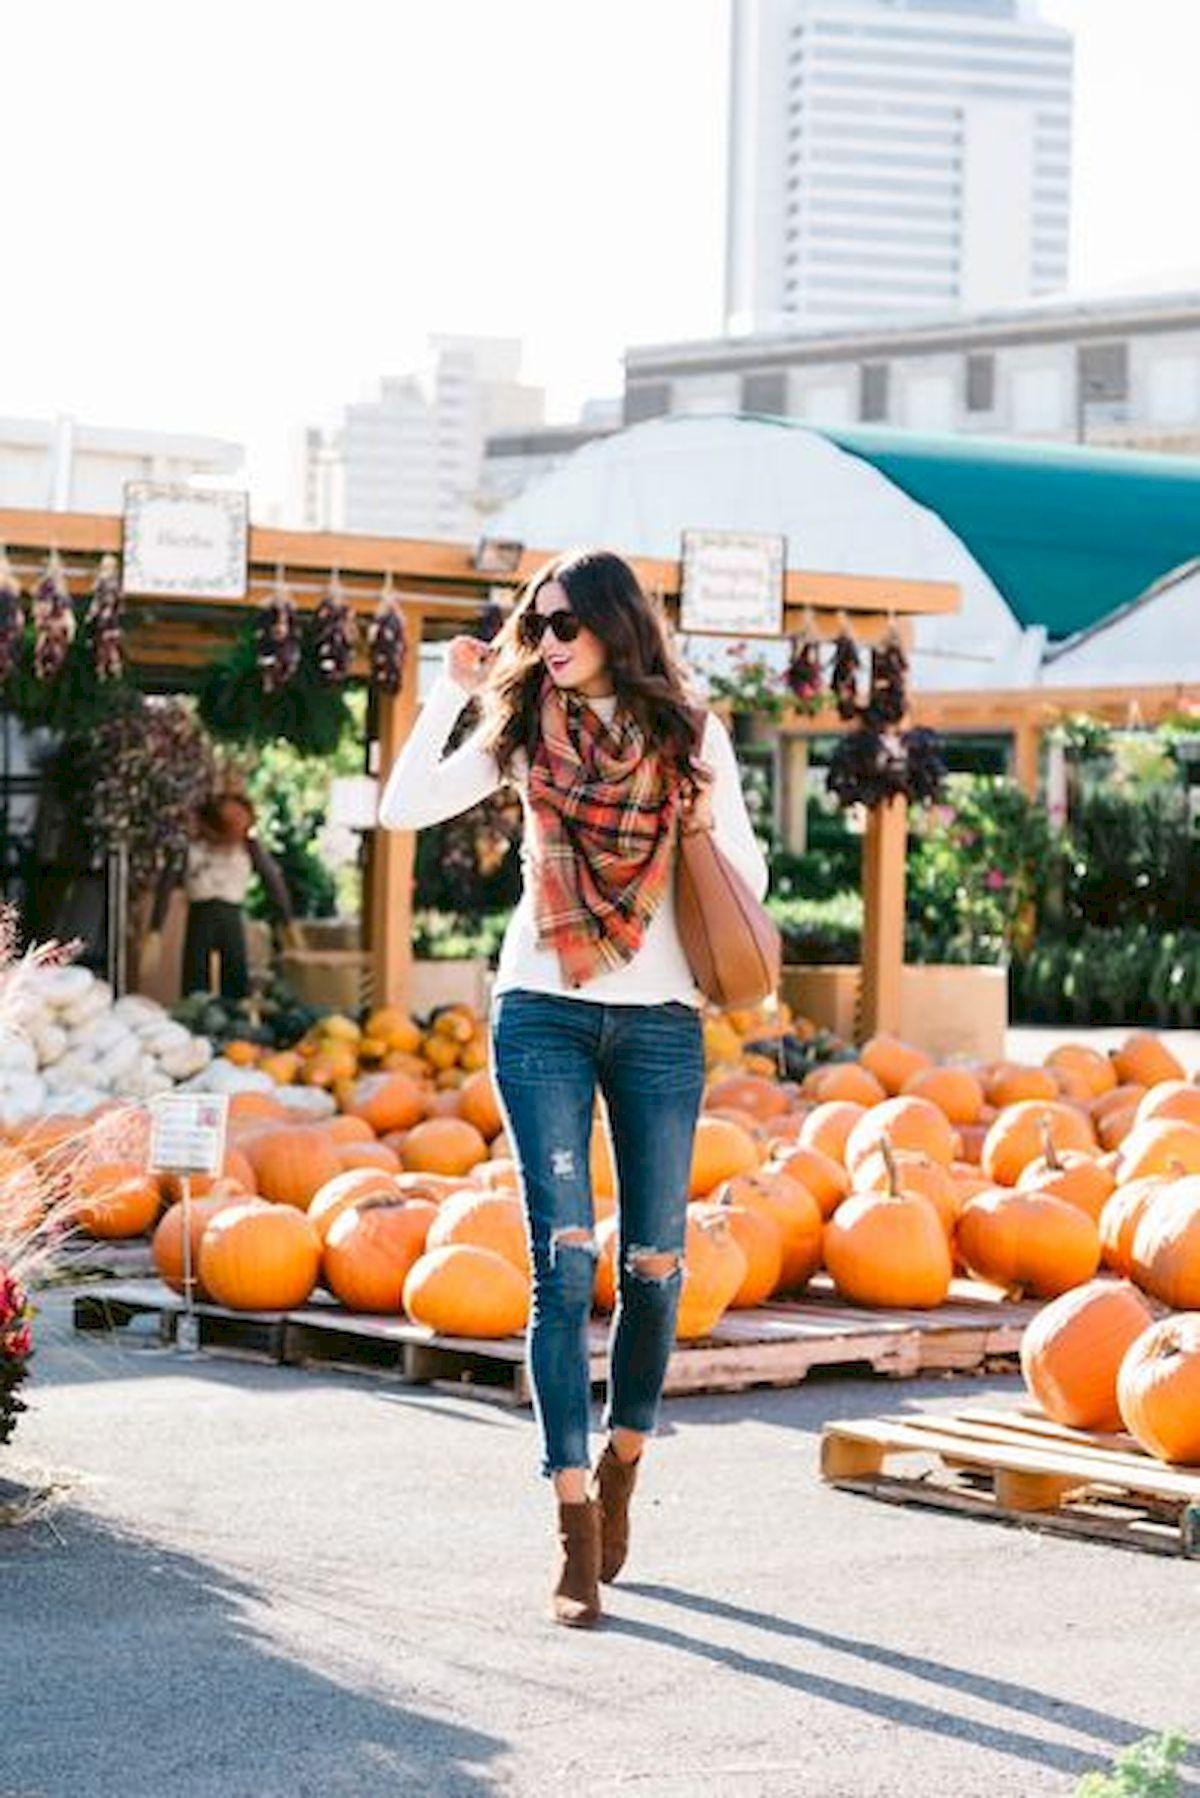 Best 40 Women Fall Outfits Ideas - Fashion and Lifestyle #pumpkinpatchoutfitwomen